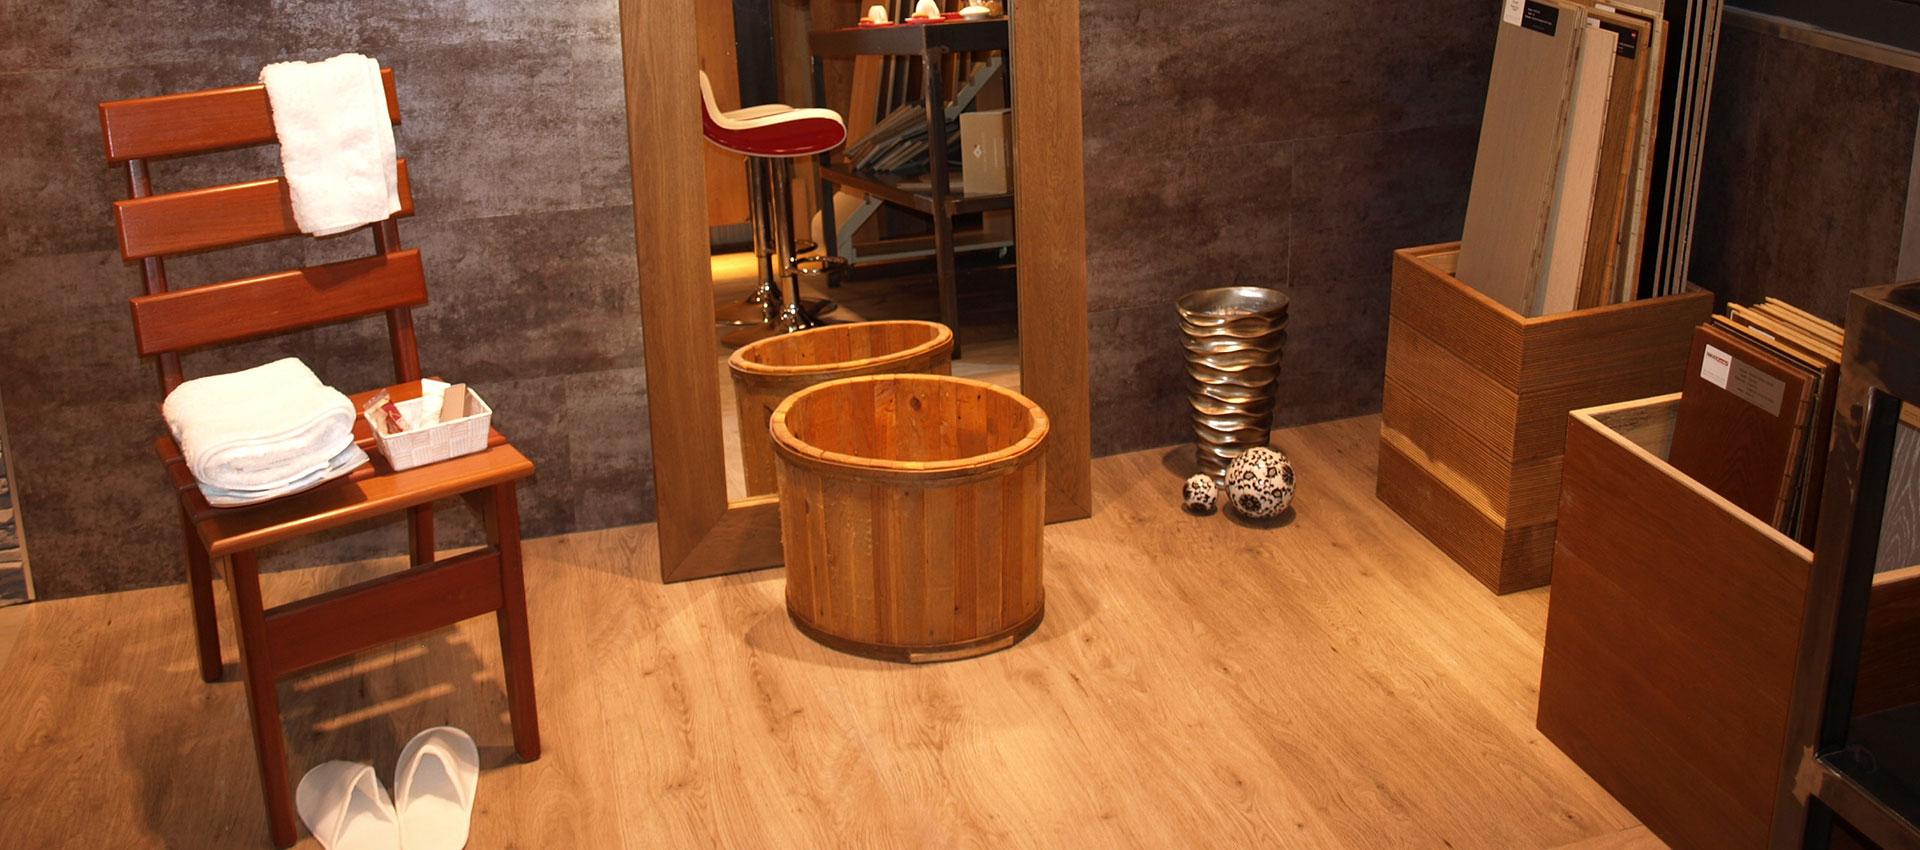 Bagno pavimento e rivestimento in PVC